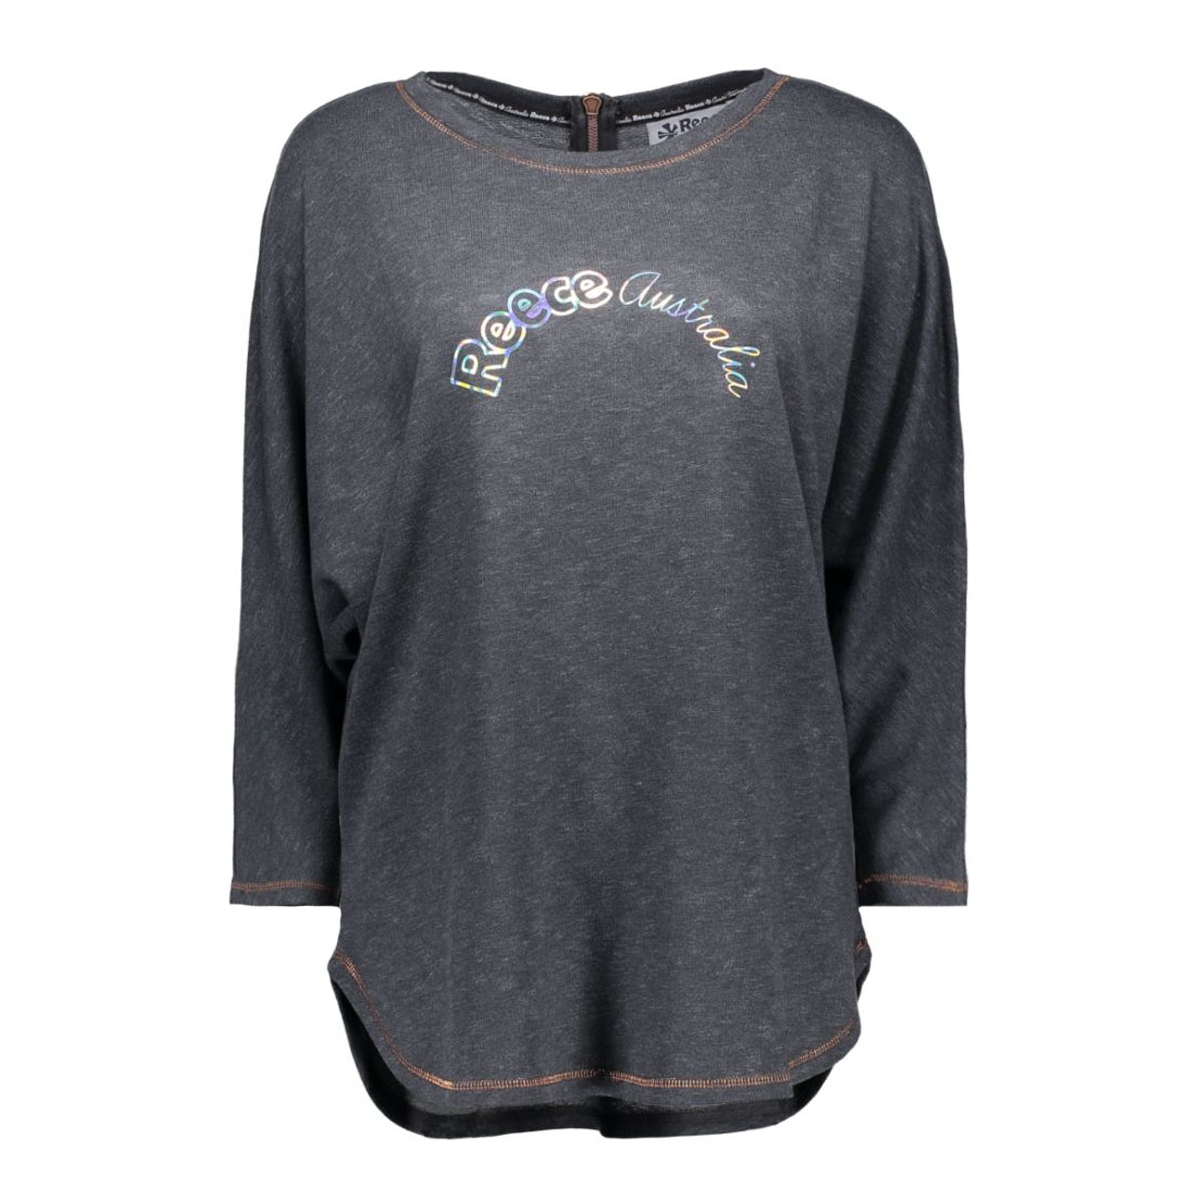 865605 heather sweat reece sport trui 9005 dark grey